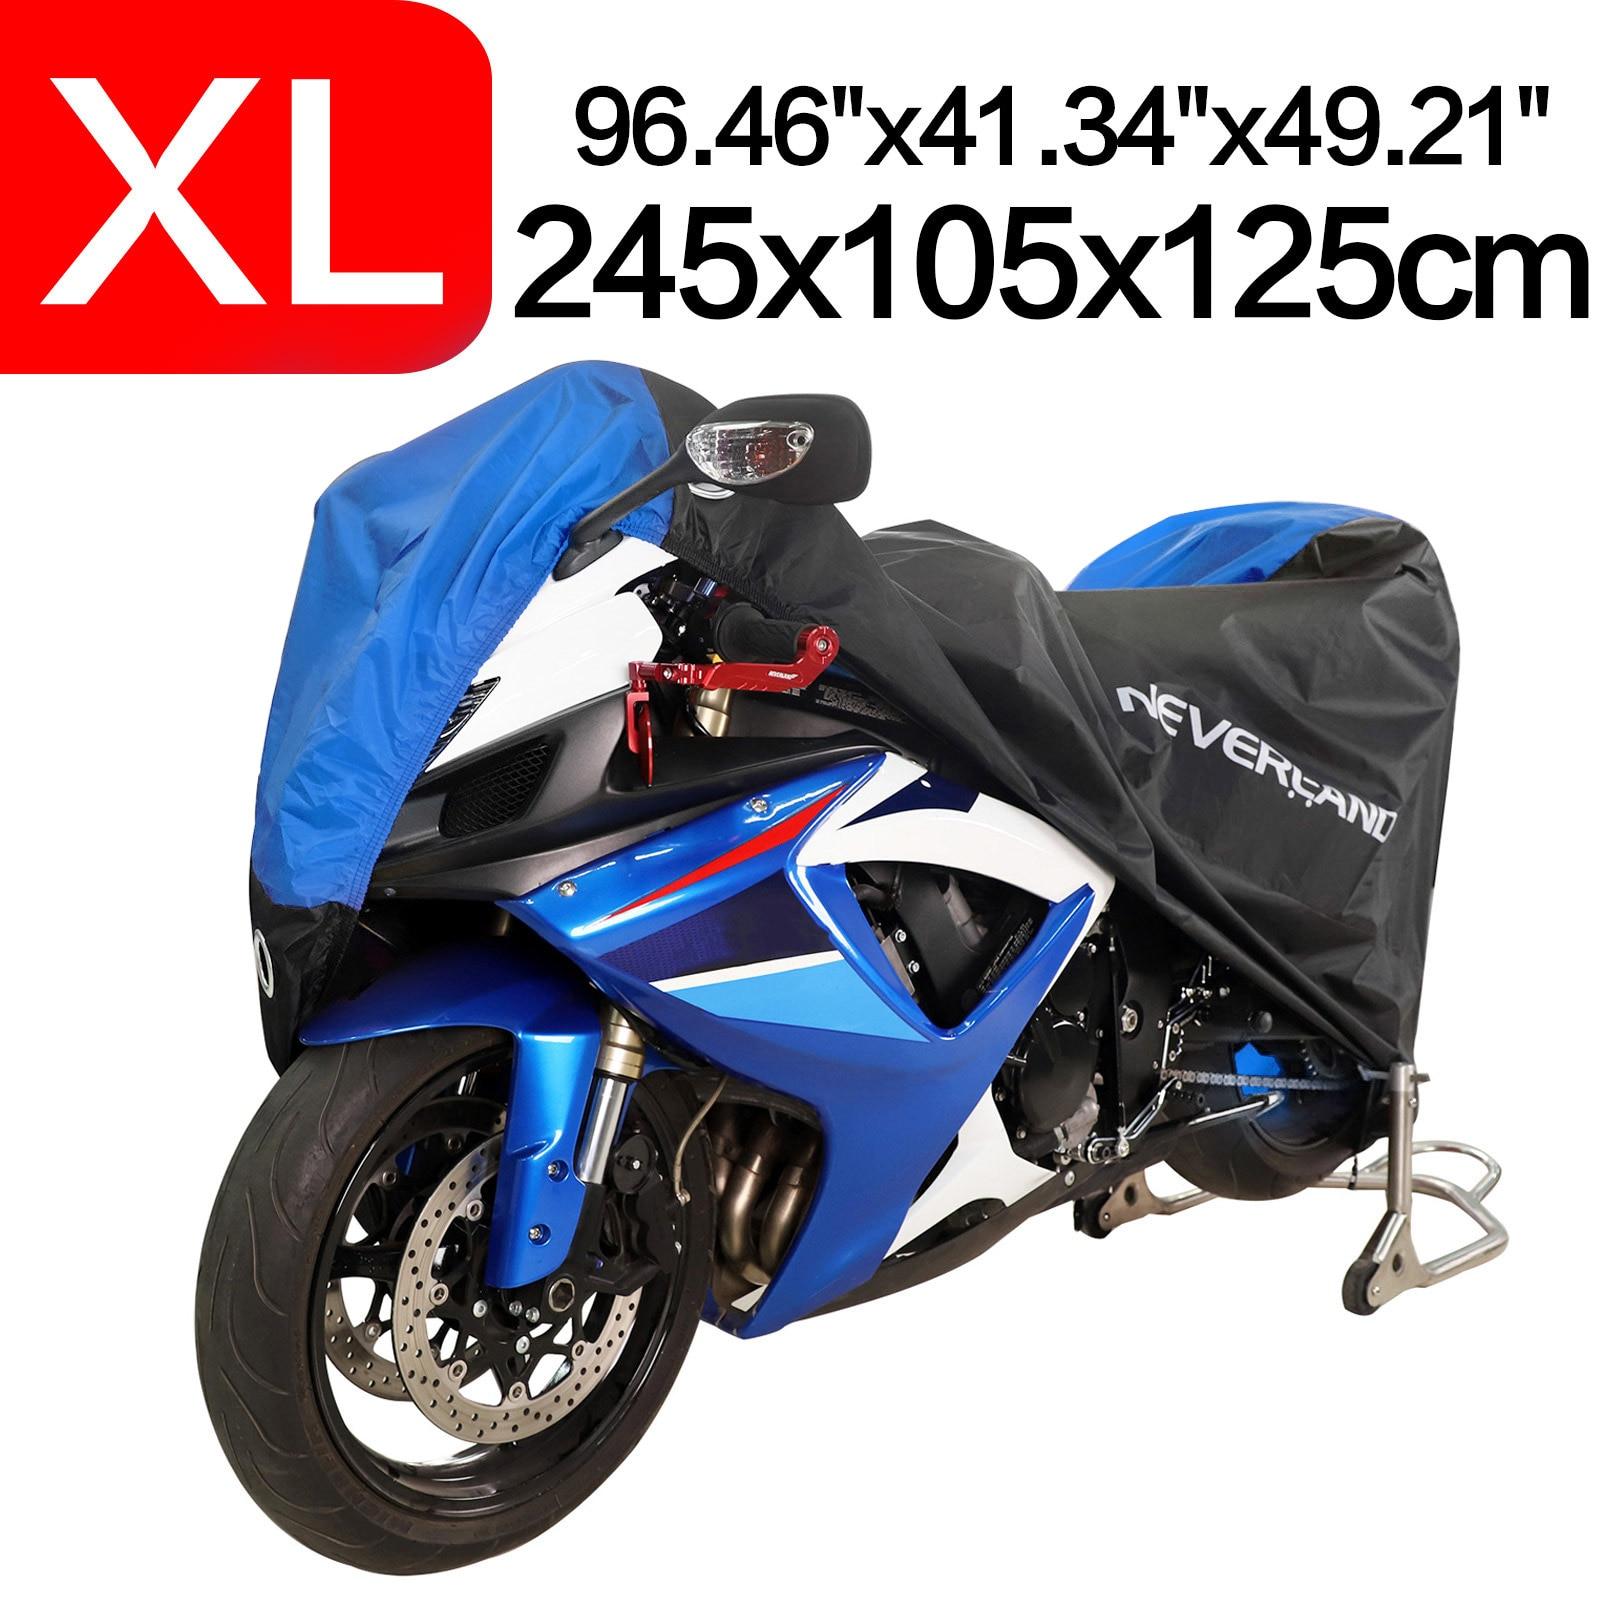 M-3XL Waterproof Outdoor Motorcycle Motorbike Cruiser Scooter Cover Black/&Orange